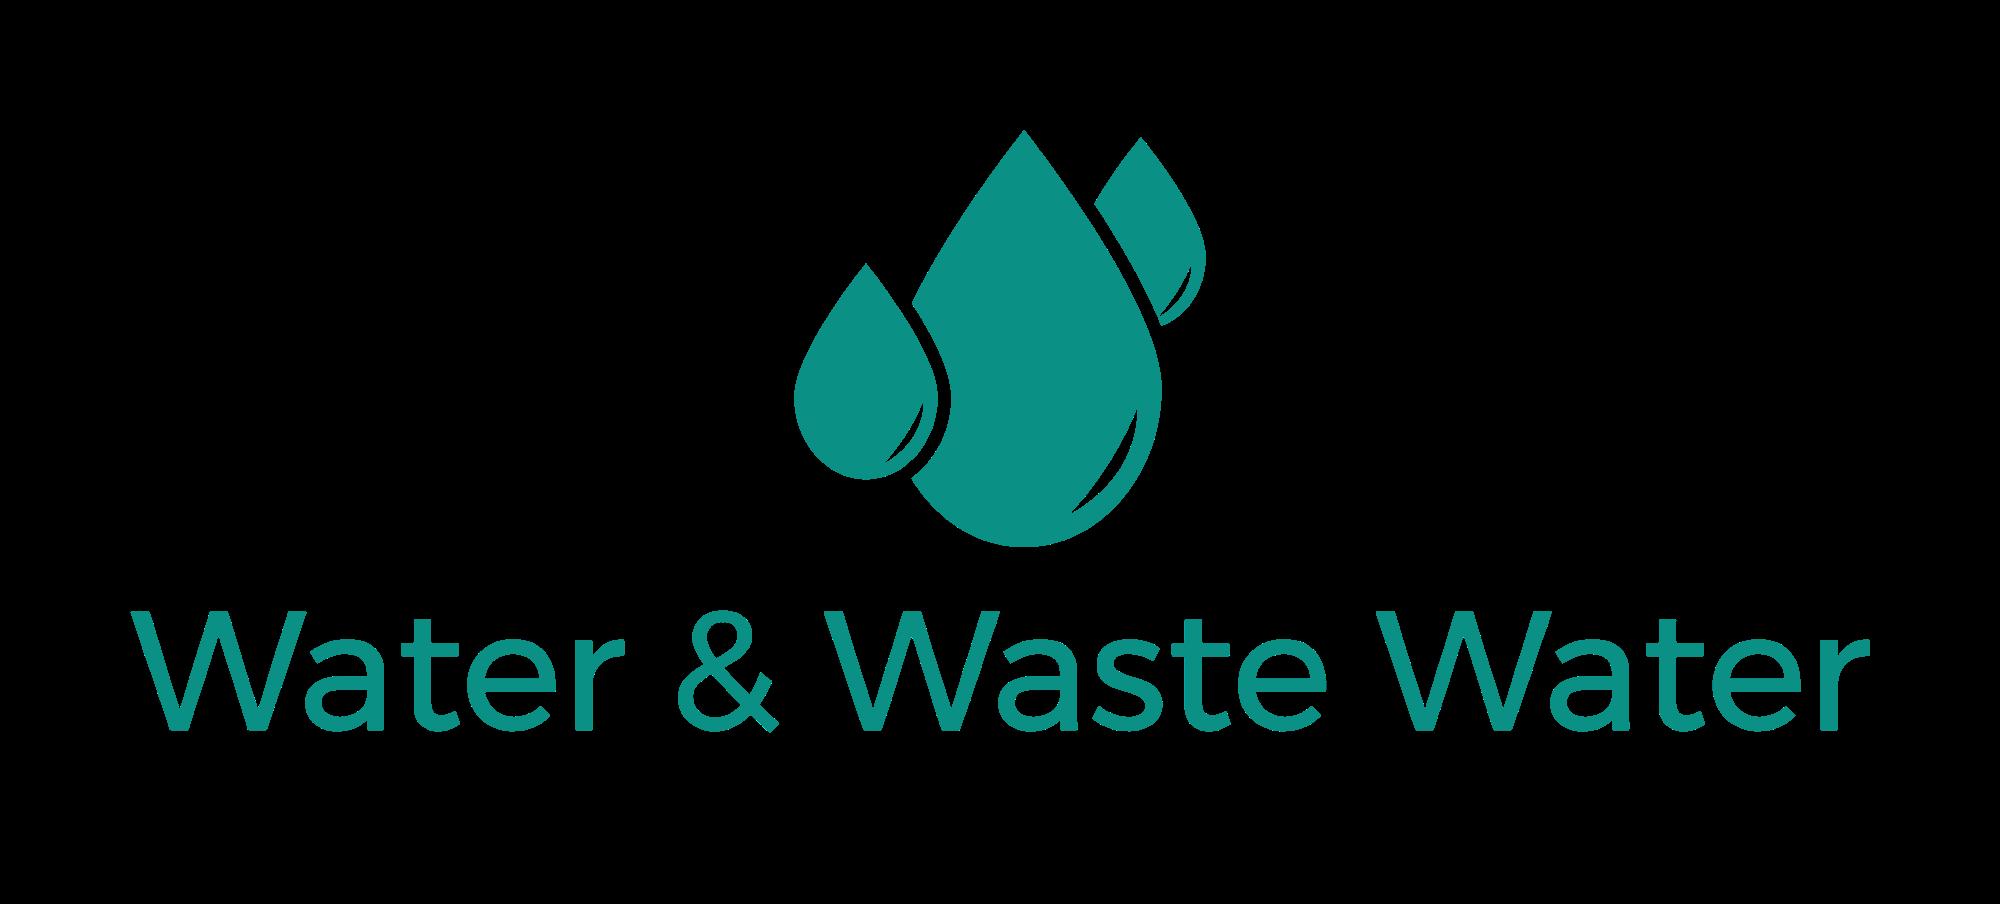 Water & Waste Water-logo.png